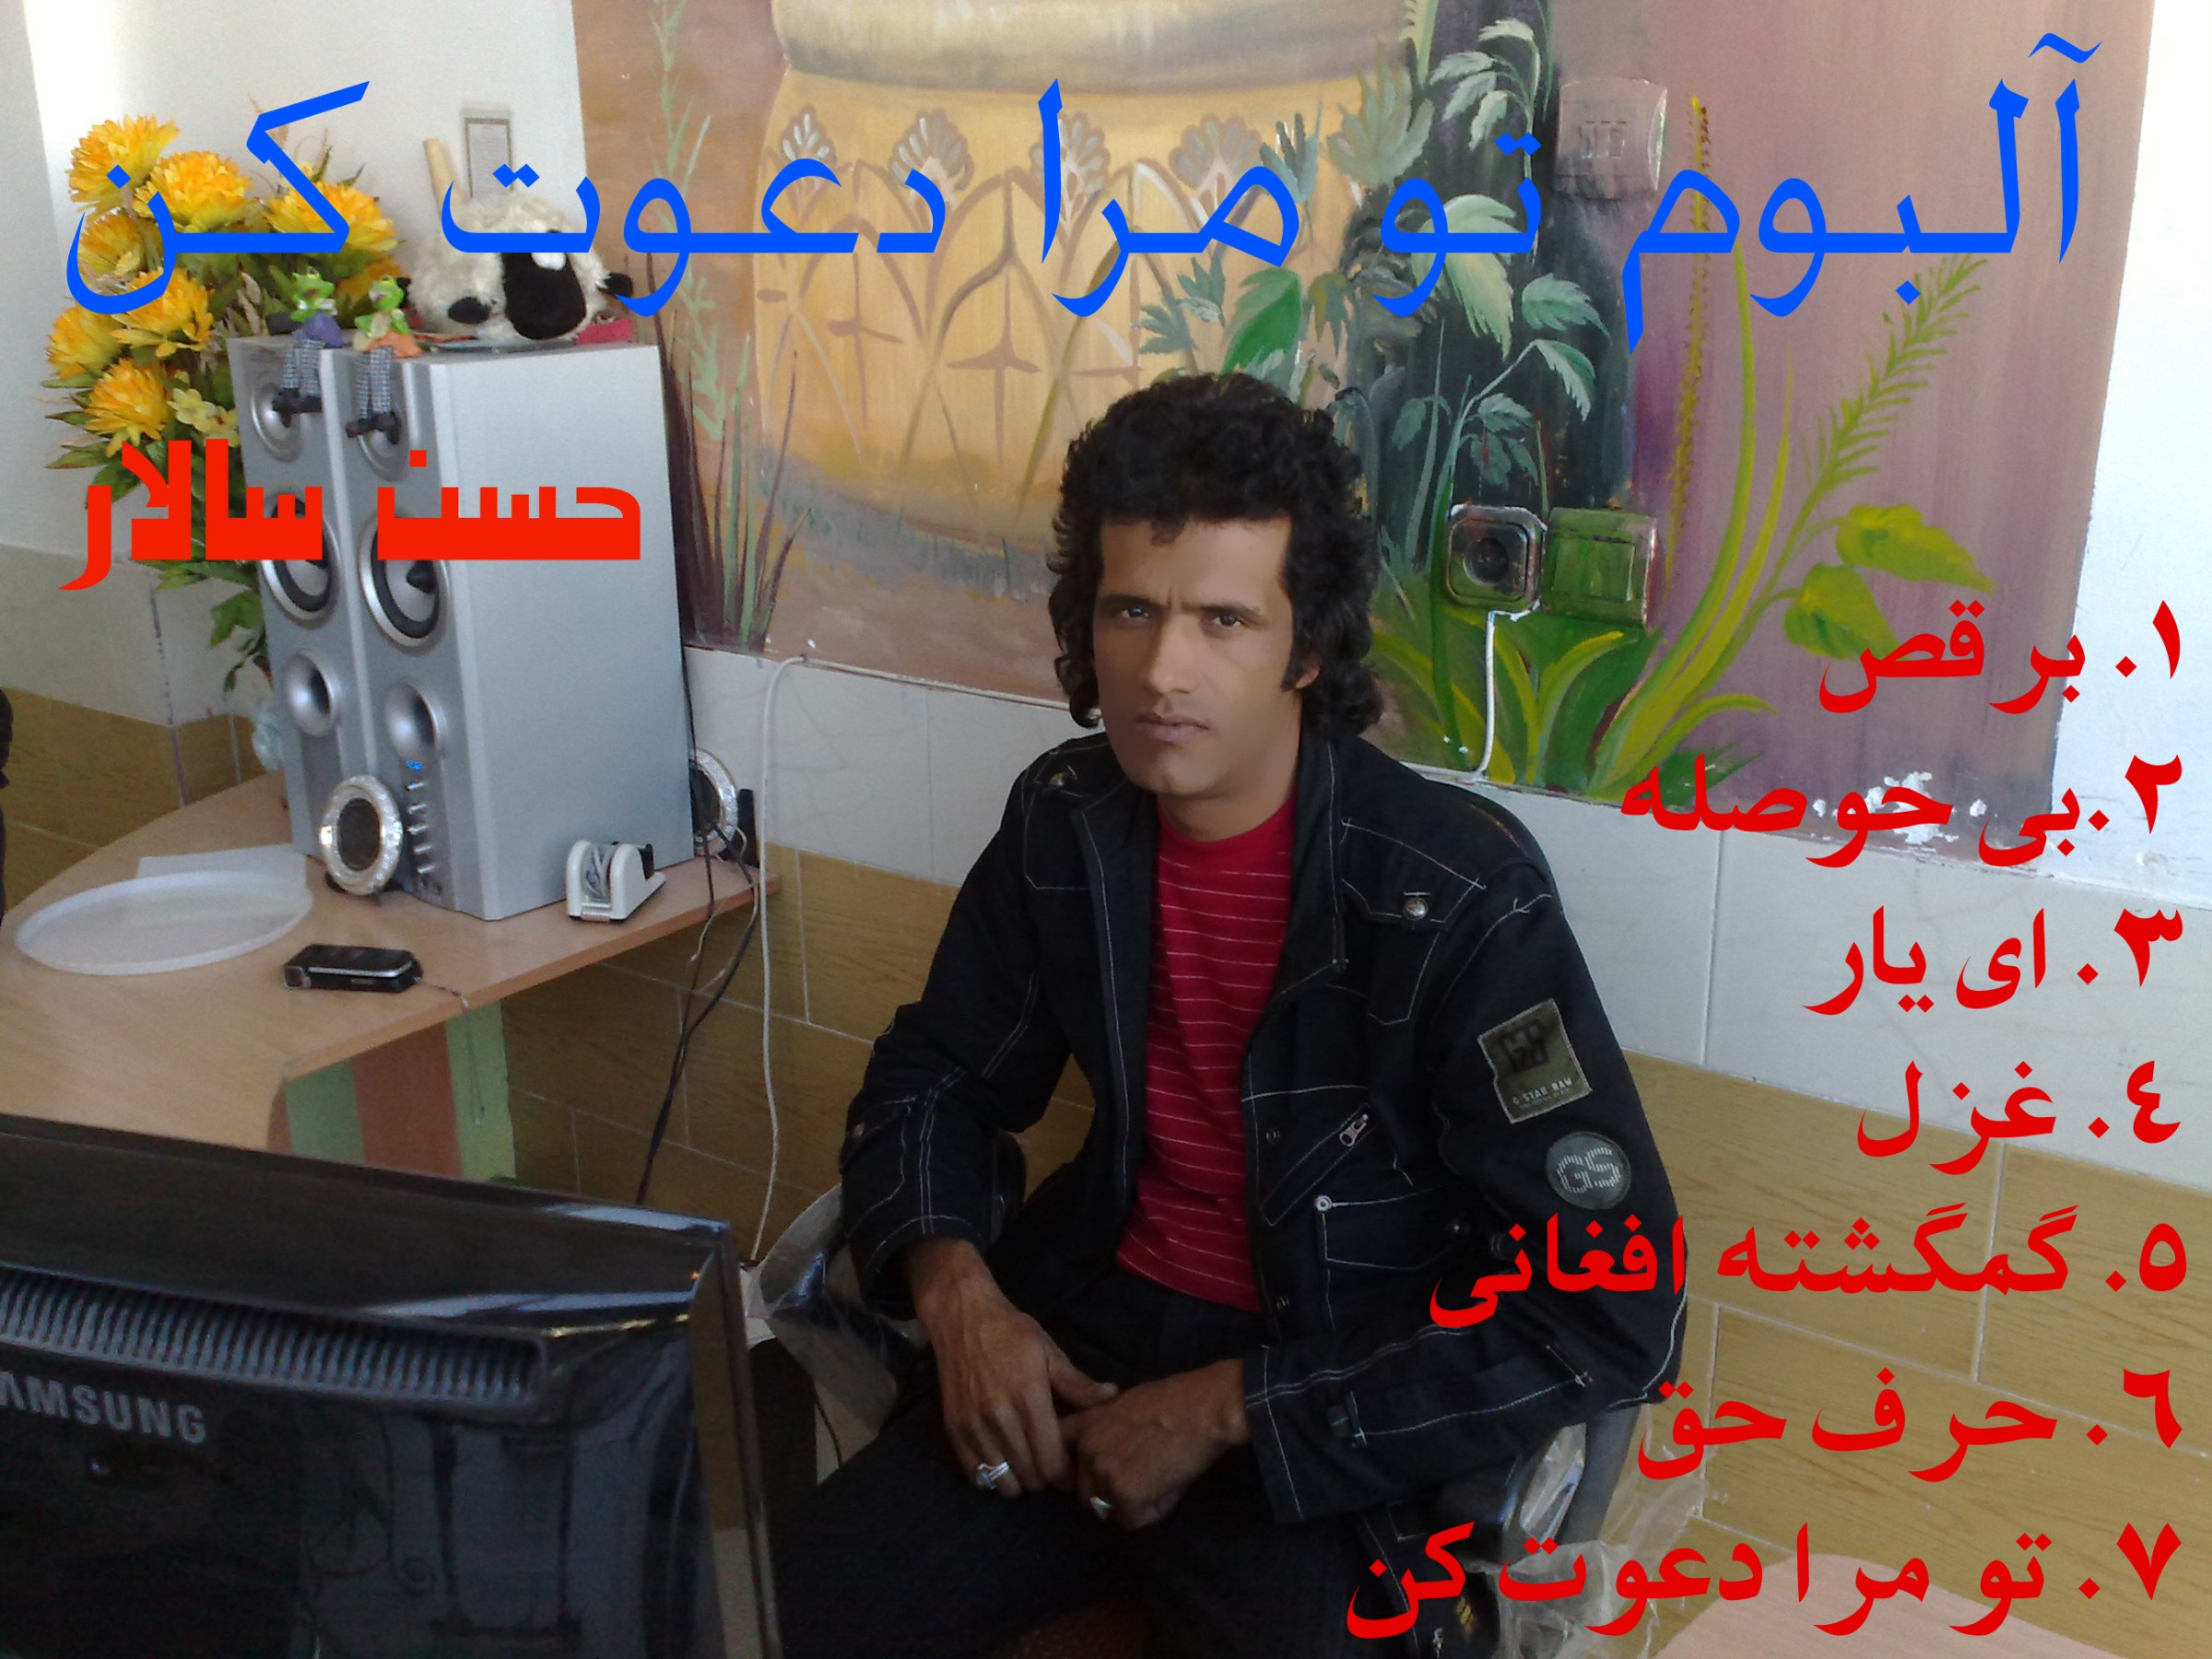 http://s6.picofile.com/file/8192947600/to_mara_daavat_kon_salar_bam.jpg